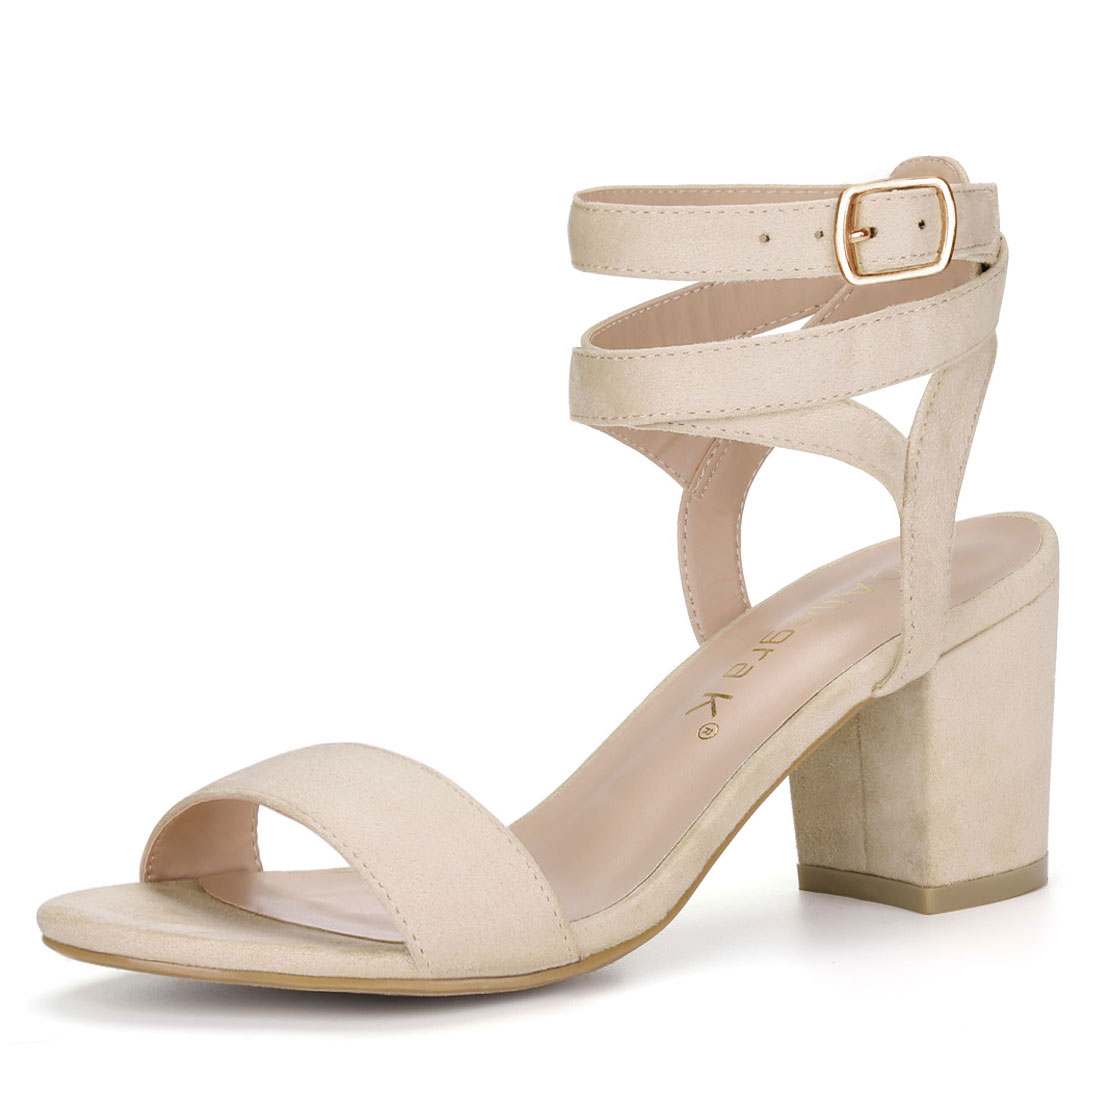 Allegra K Women's Block Heels Double Ankle Straps Sandals BeigeUS 10